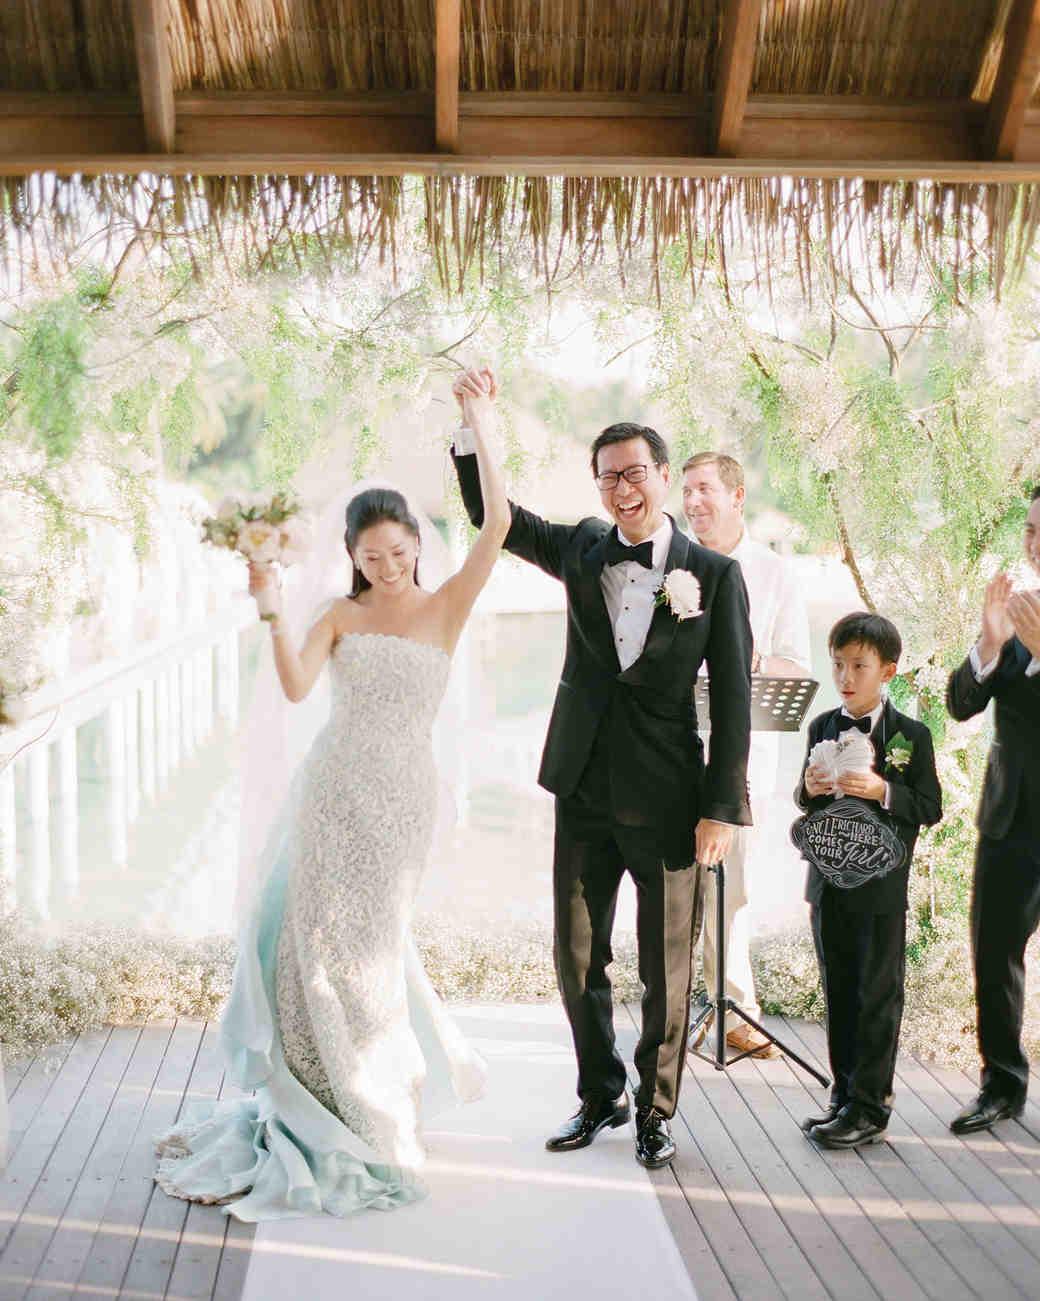 peony-richard-wedding-maldives-couple-happy-cheer-1594-s112383.jpg